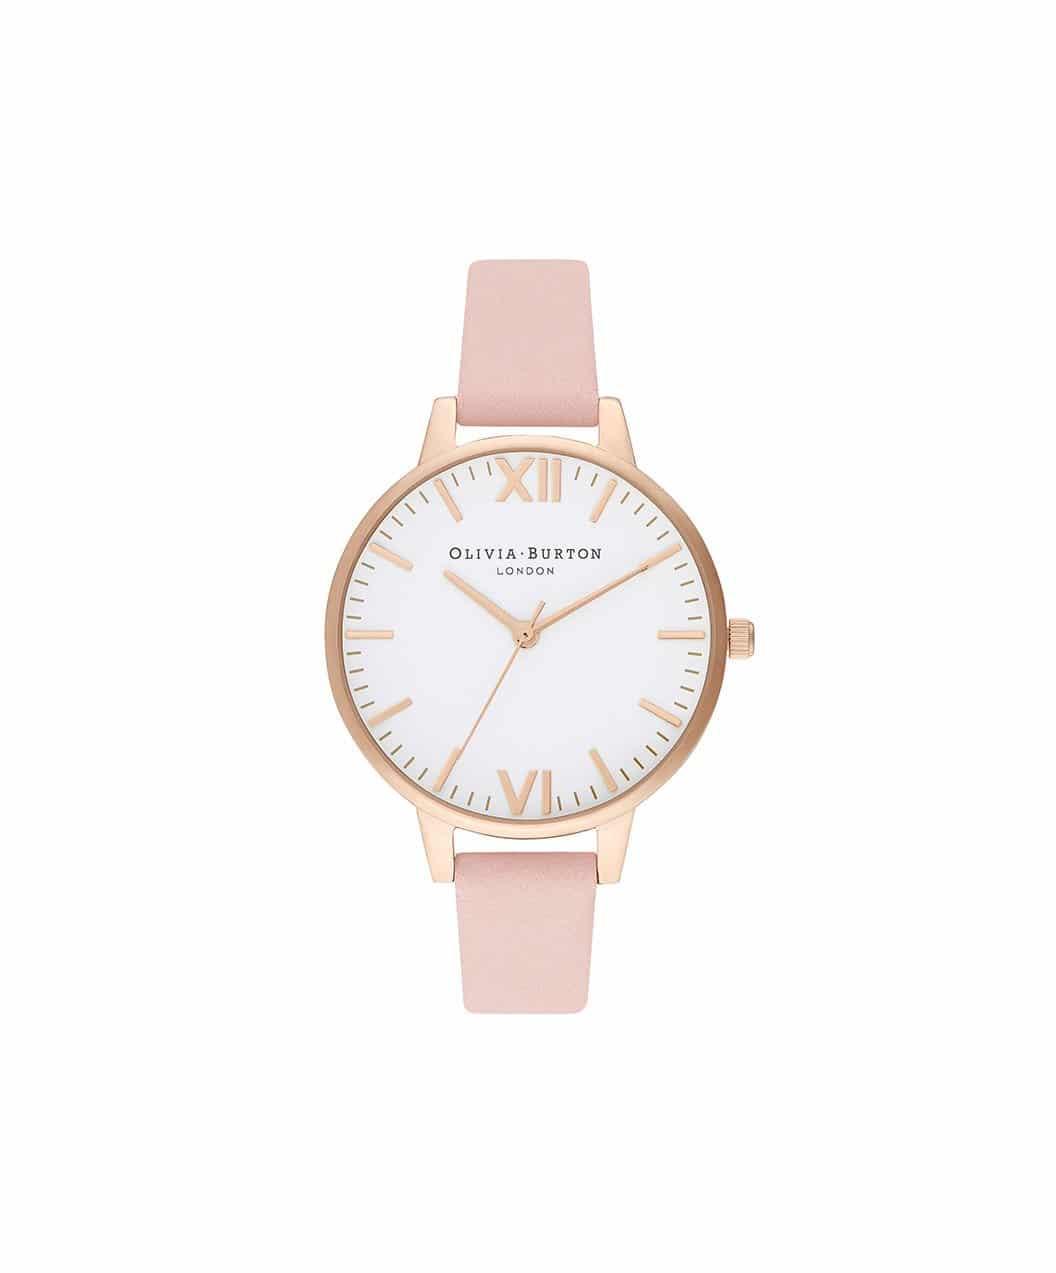 Olivia Burton Dusty Pink & Pale Gold Watch